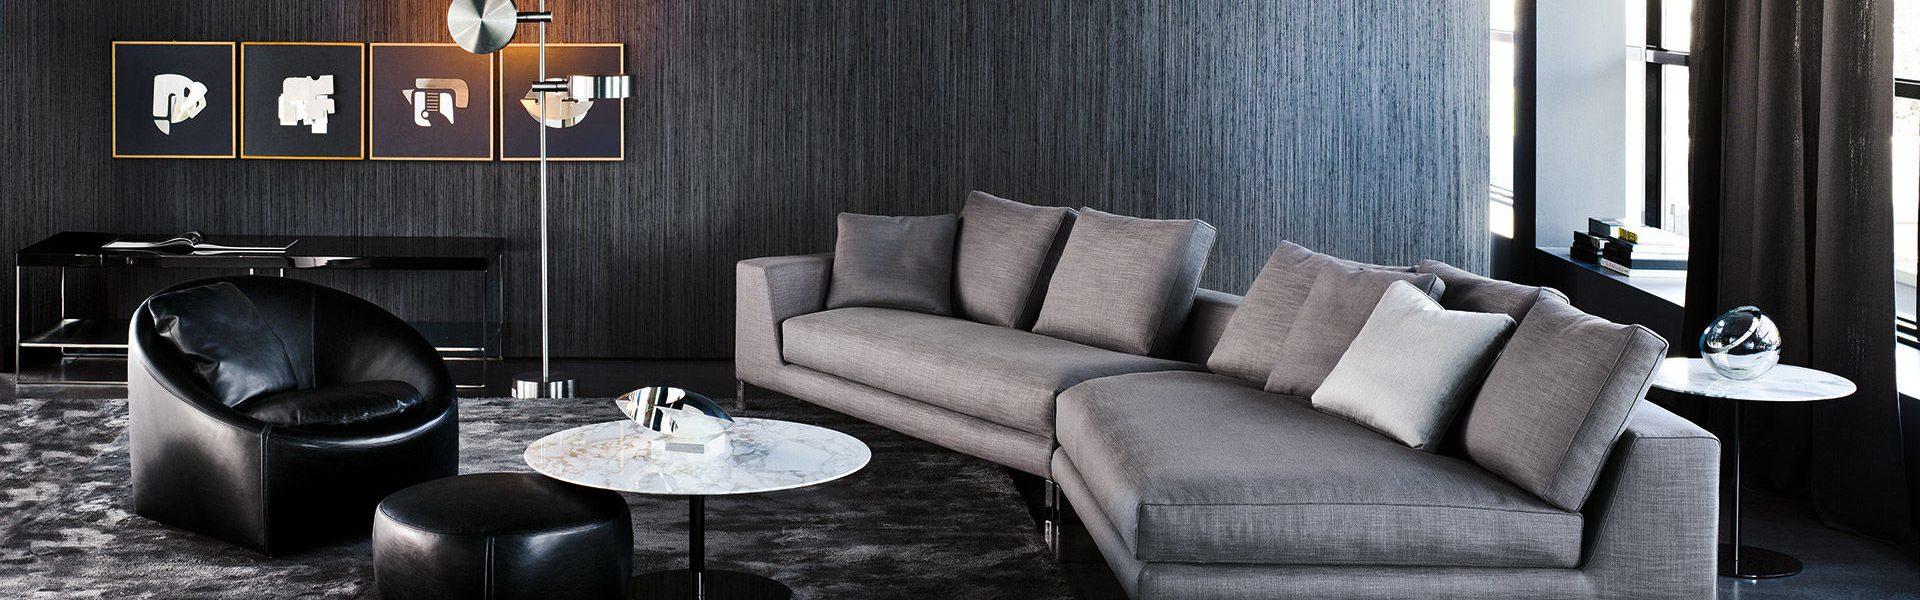 Hamilton Islands Sofa